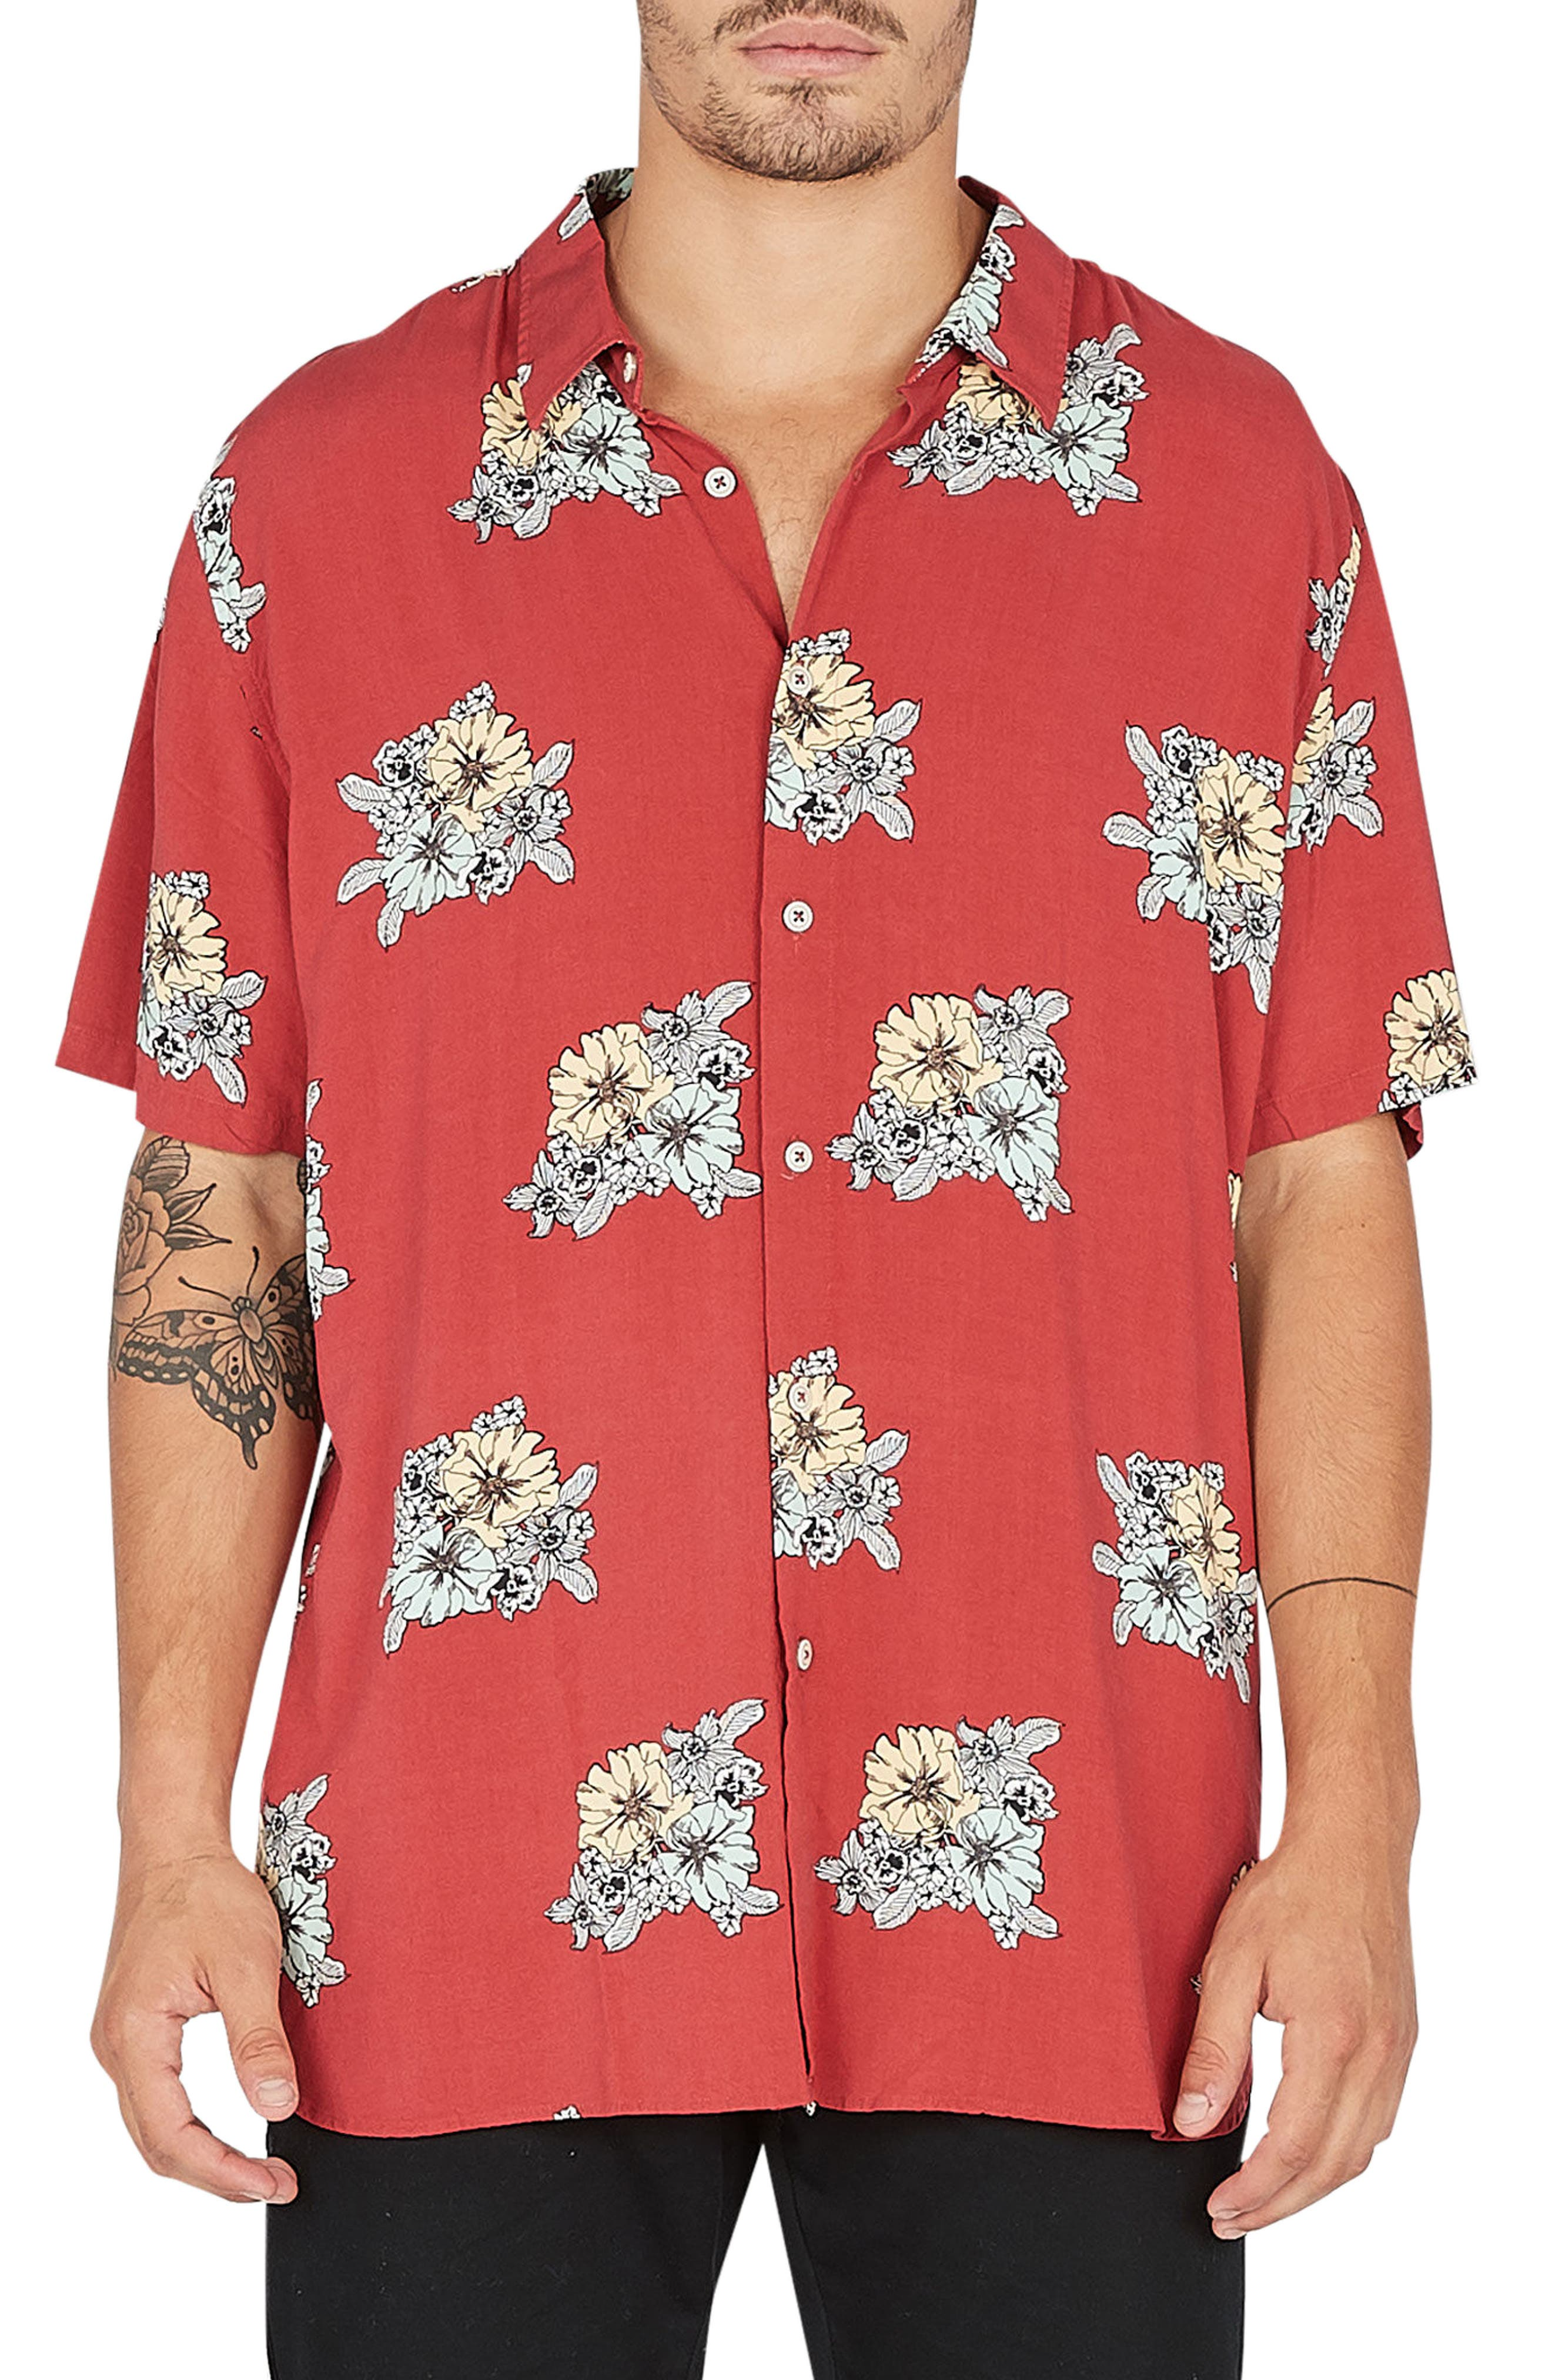 Holiday Woven Shirt,                             Main thumbnail 1, color,                             Red Floral